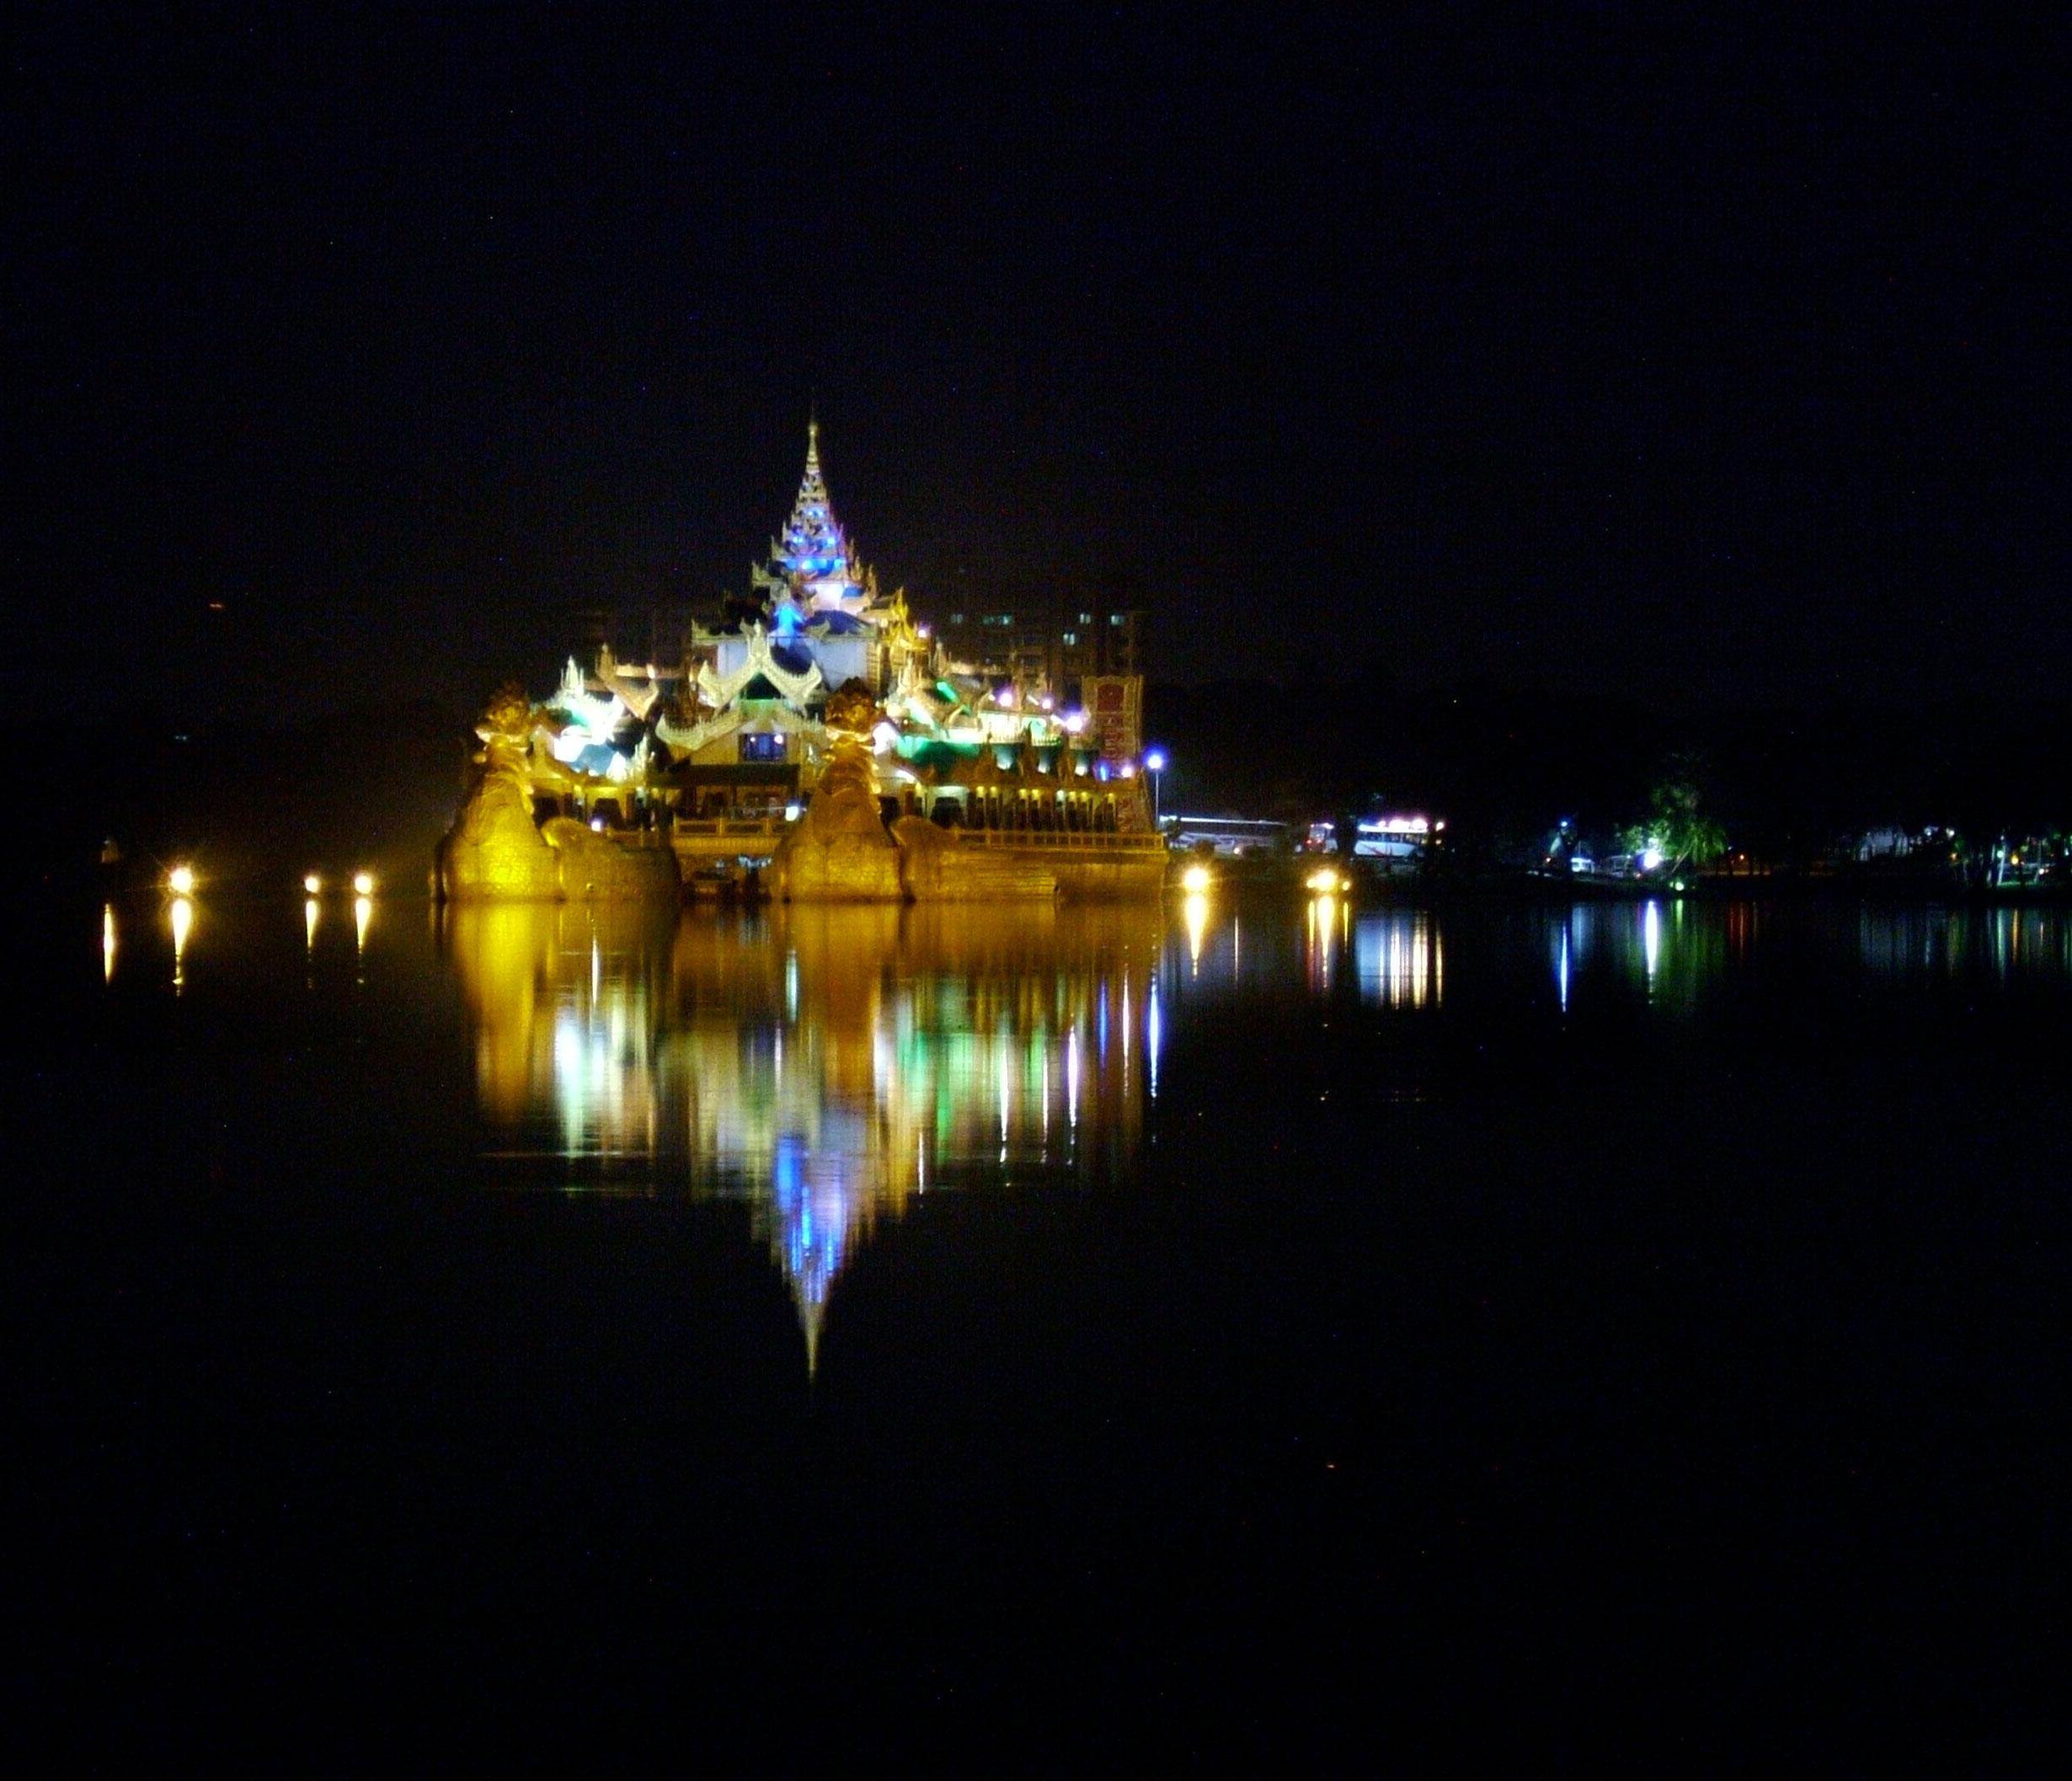 Myanmar Yangon Kandawgyi Palace Hotel royal barge Nov 2004 09